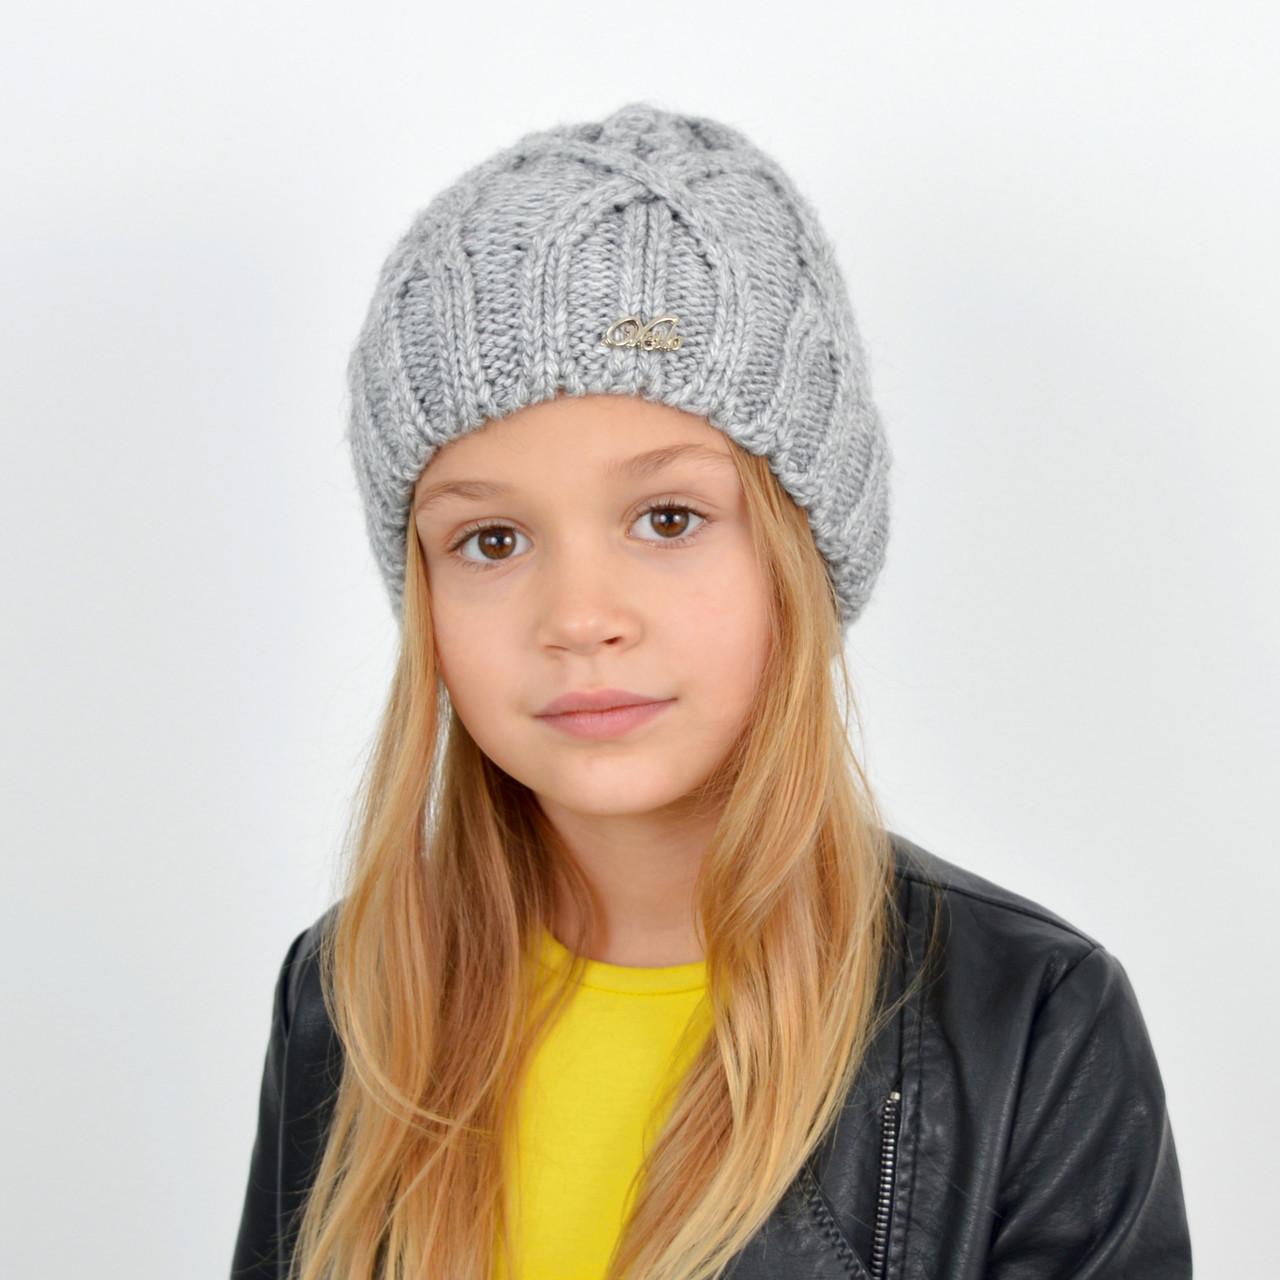 Детская вязаная шапка 3360 Светлый серый